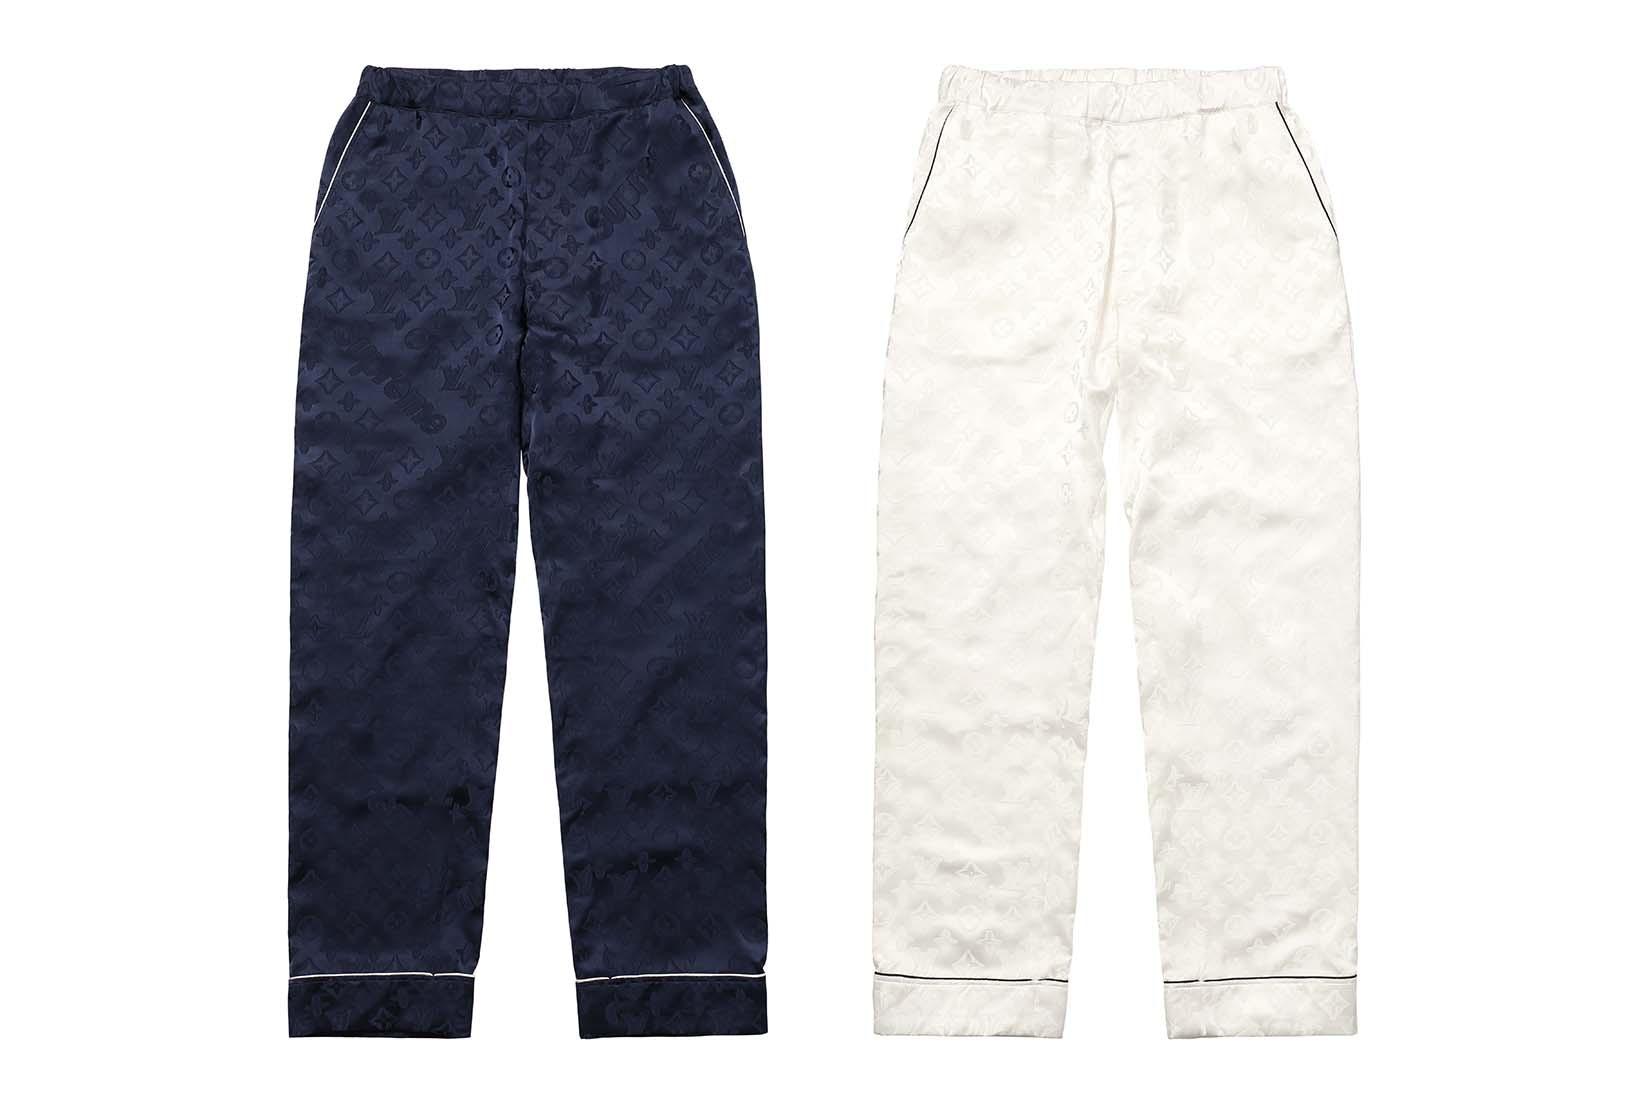 Supreme(シュプリーム)×Louis Vuitton(ルイ・ヴィトン) / ジャカード シルク パジャマ パンツ(Jacquard Silk Pajama Pant)